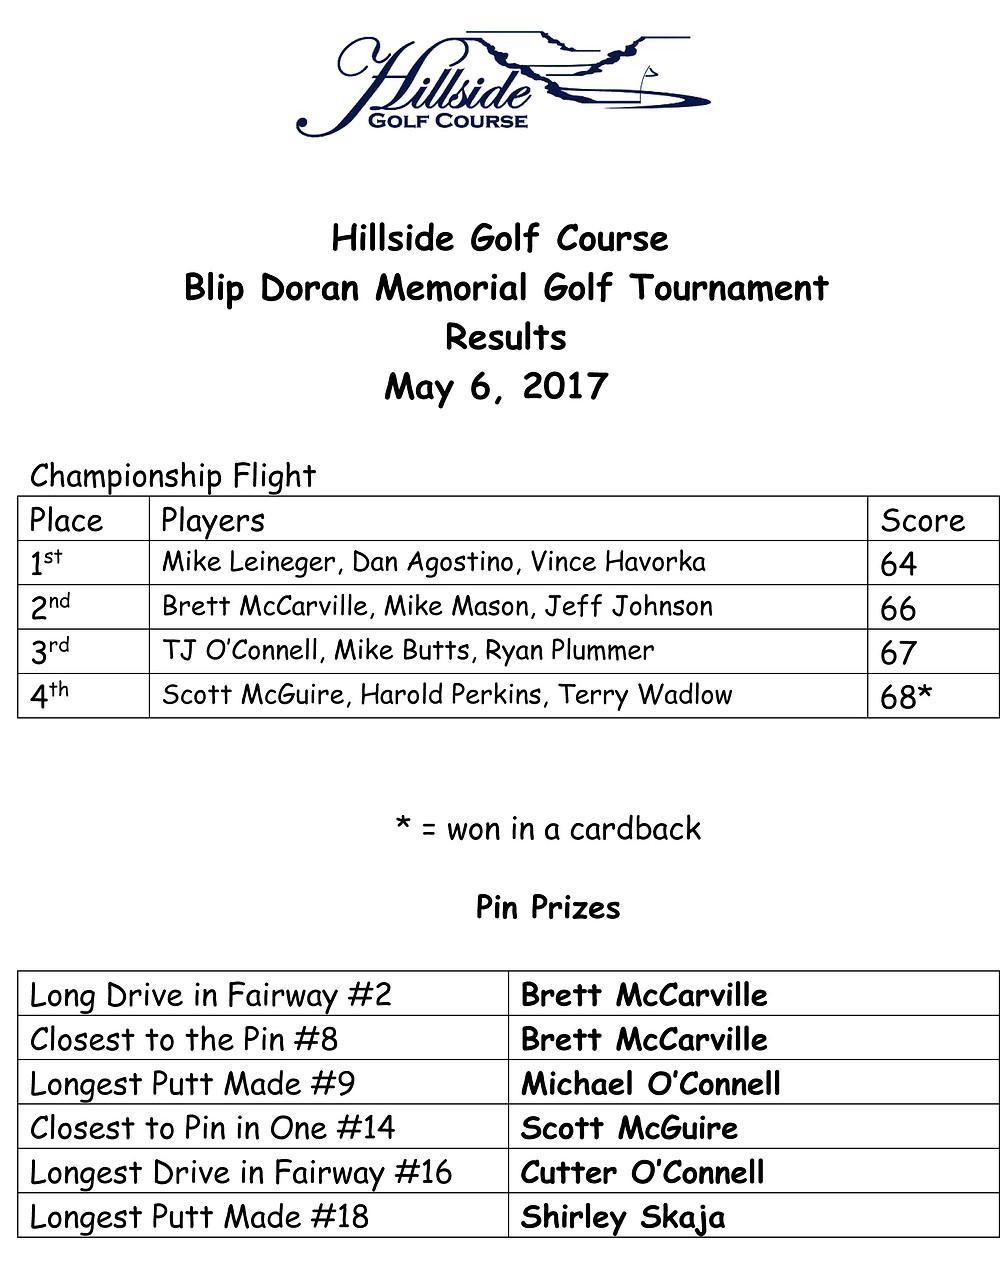 Blip Doran Memorial Golf Tournament Results May 6, 2017